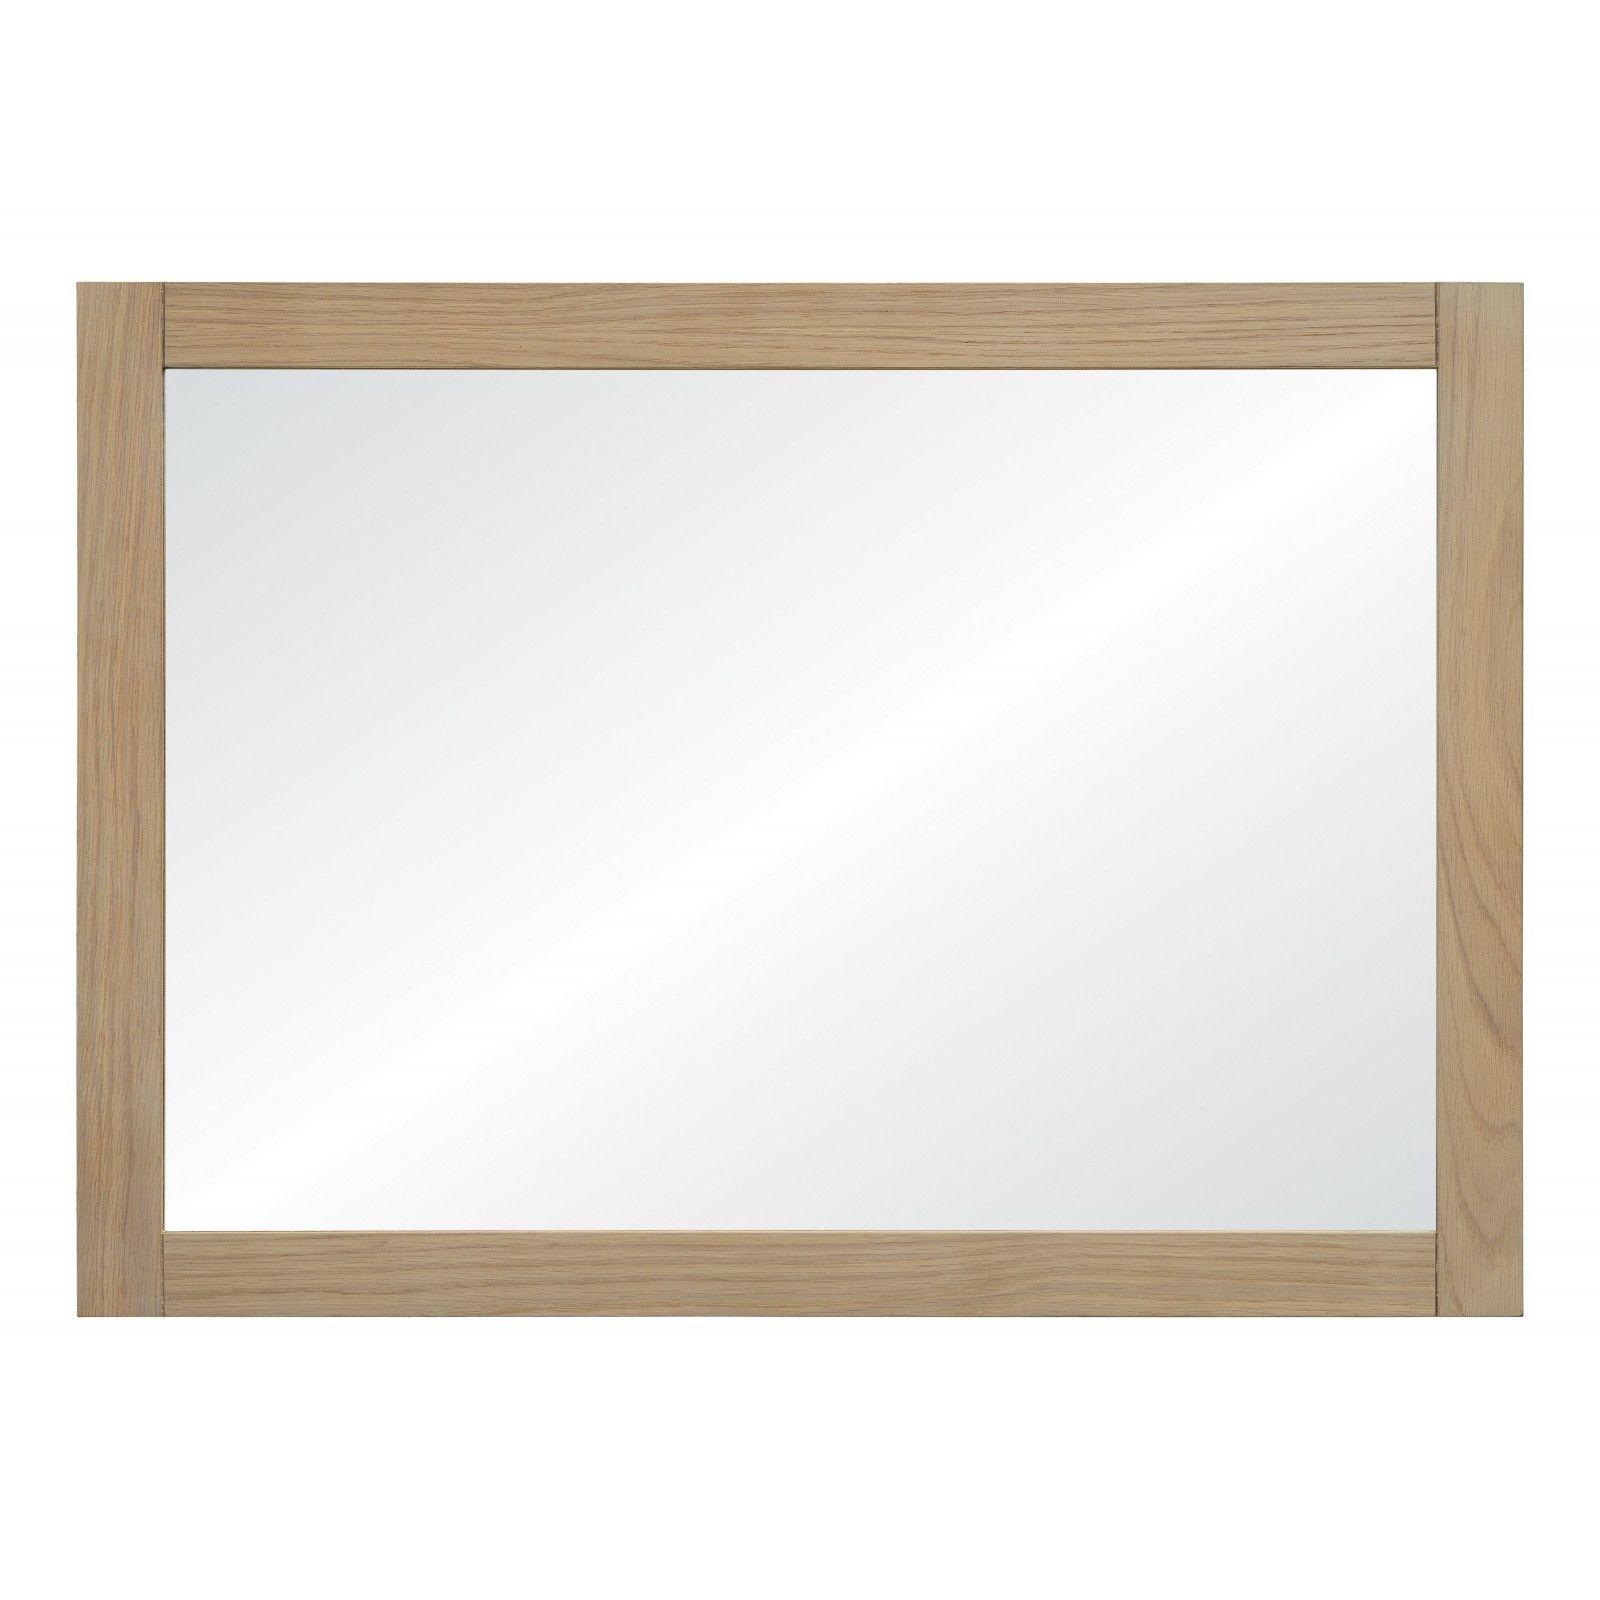 Miroir salle de bain chêne naturel L50 x H70 PALM